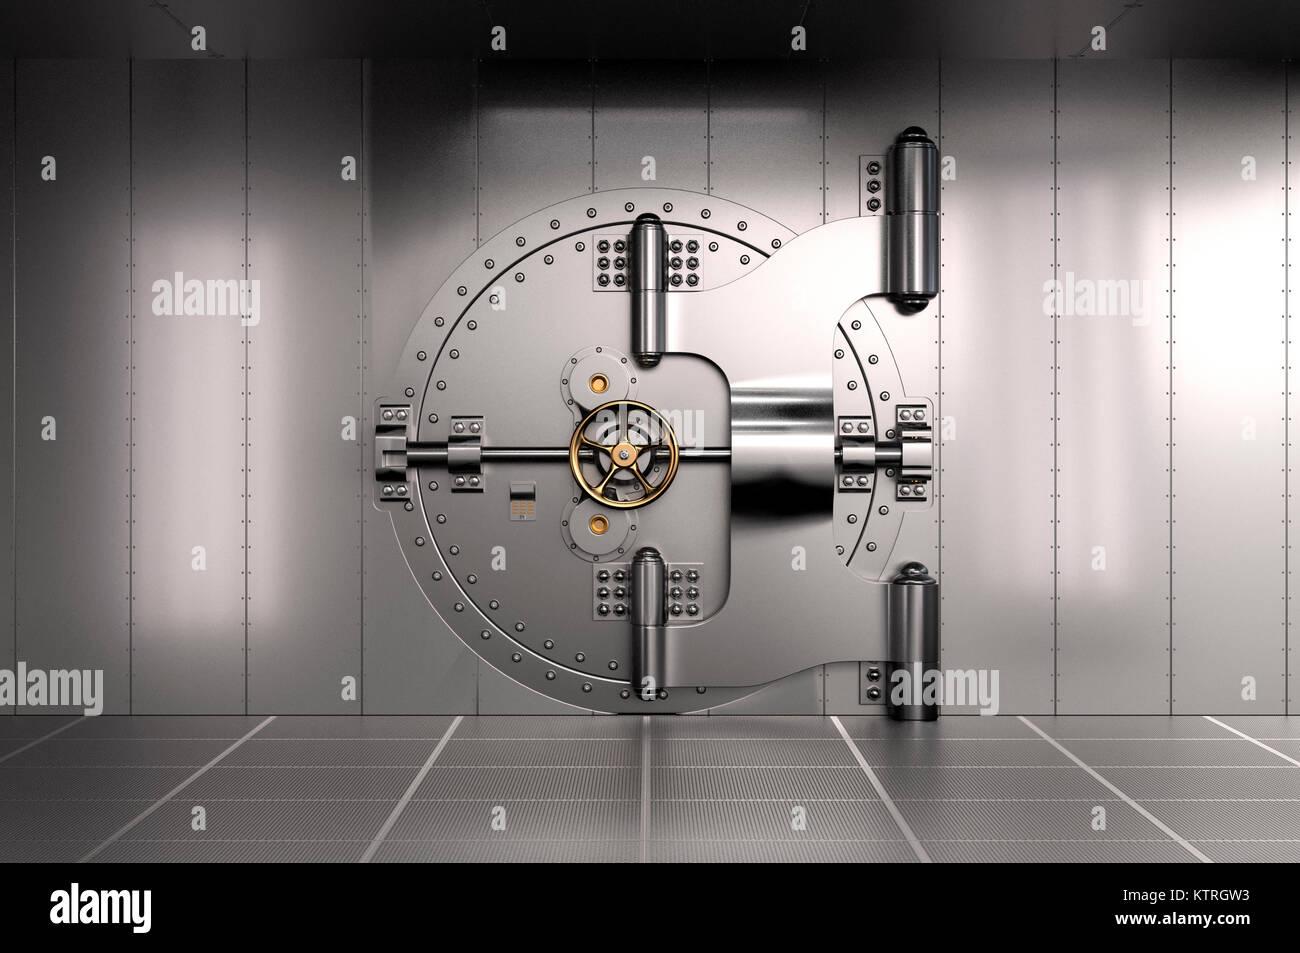 Closed Bank Vault Door. 3D illustration - Stock Image